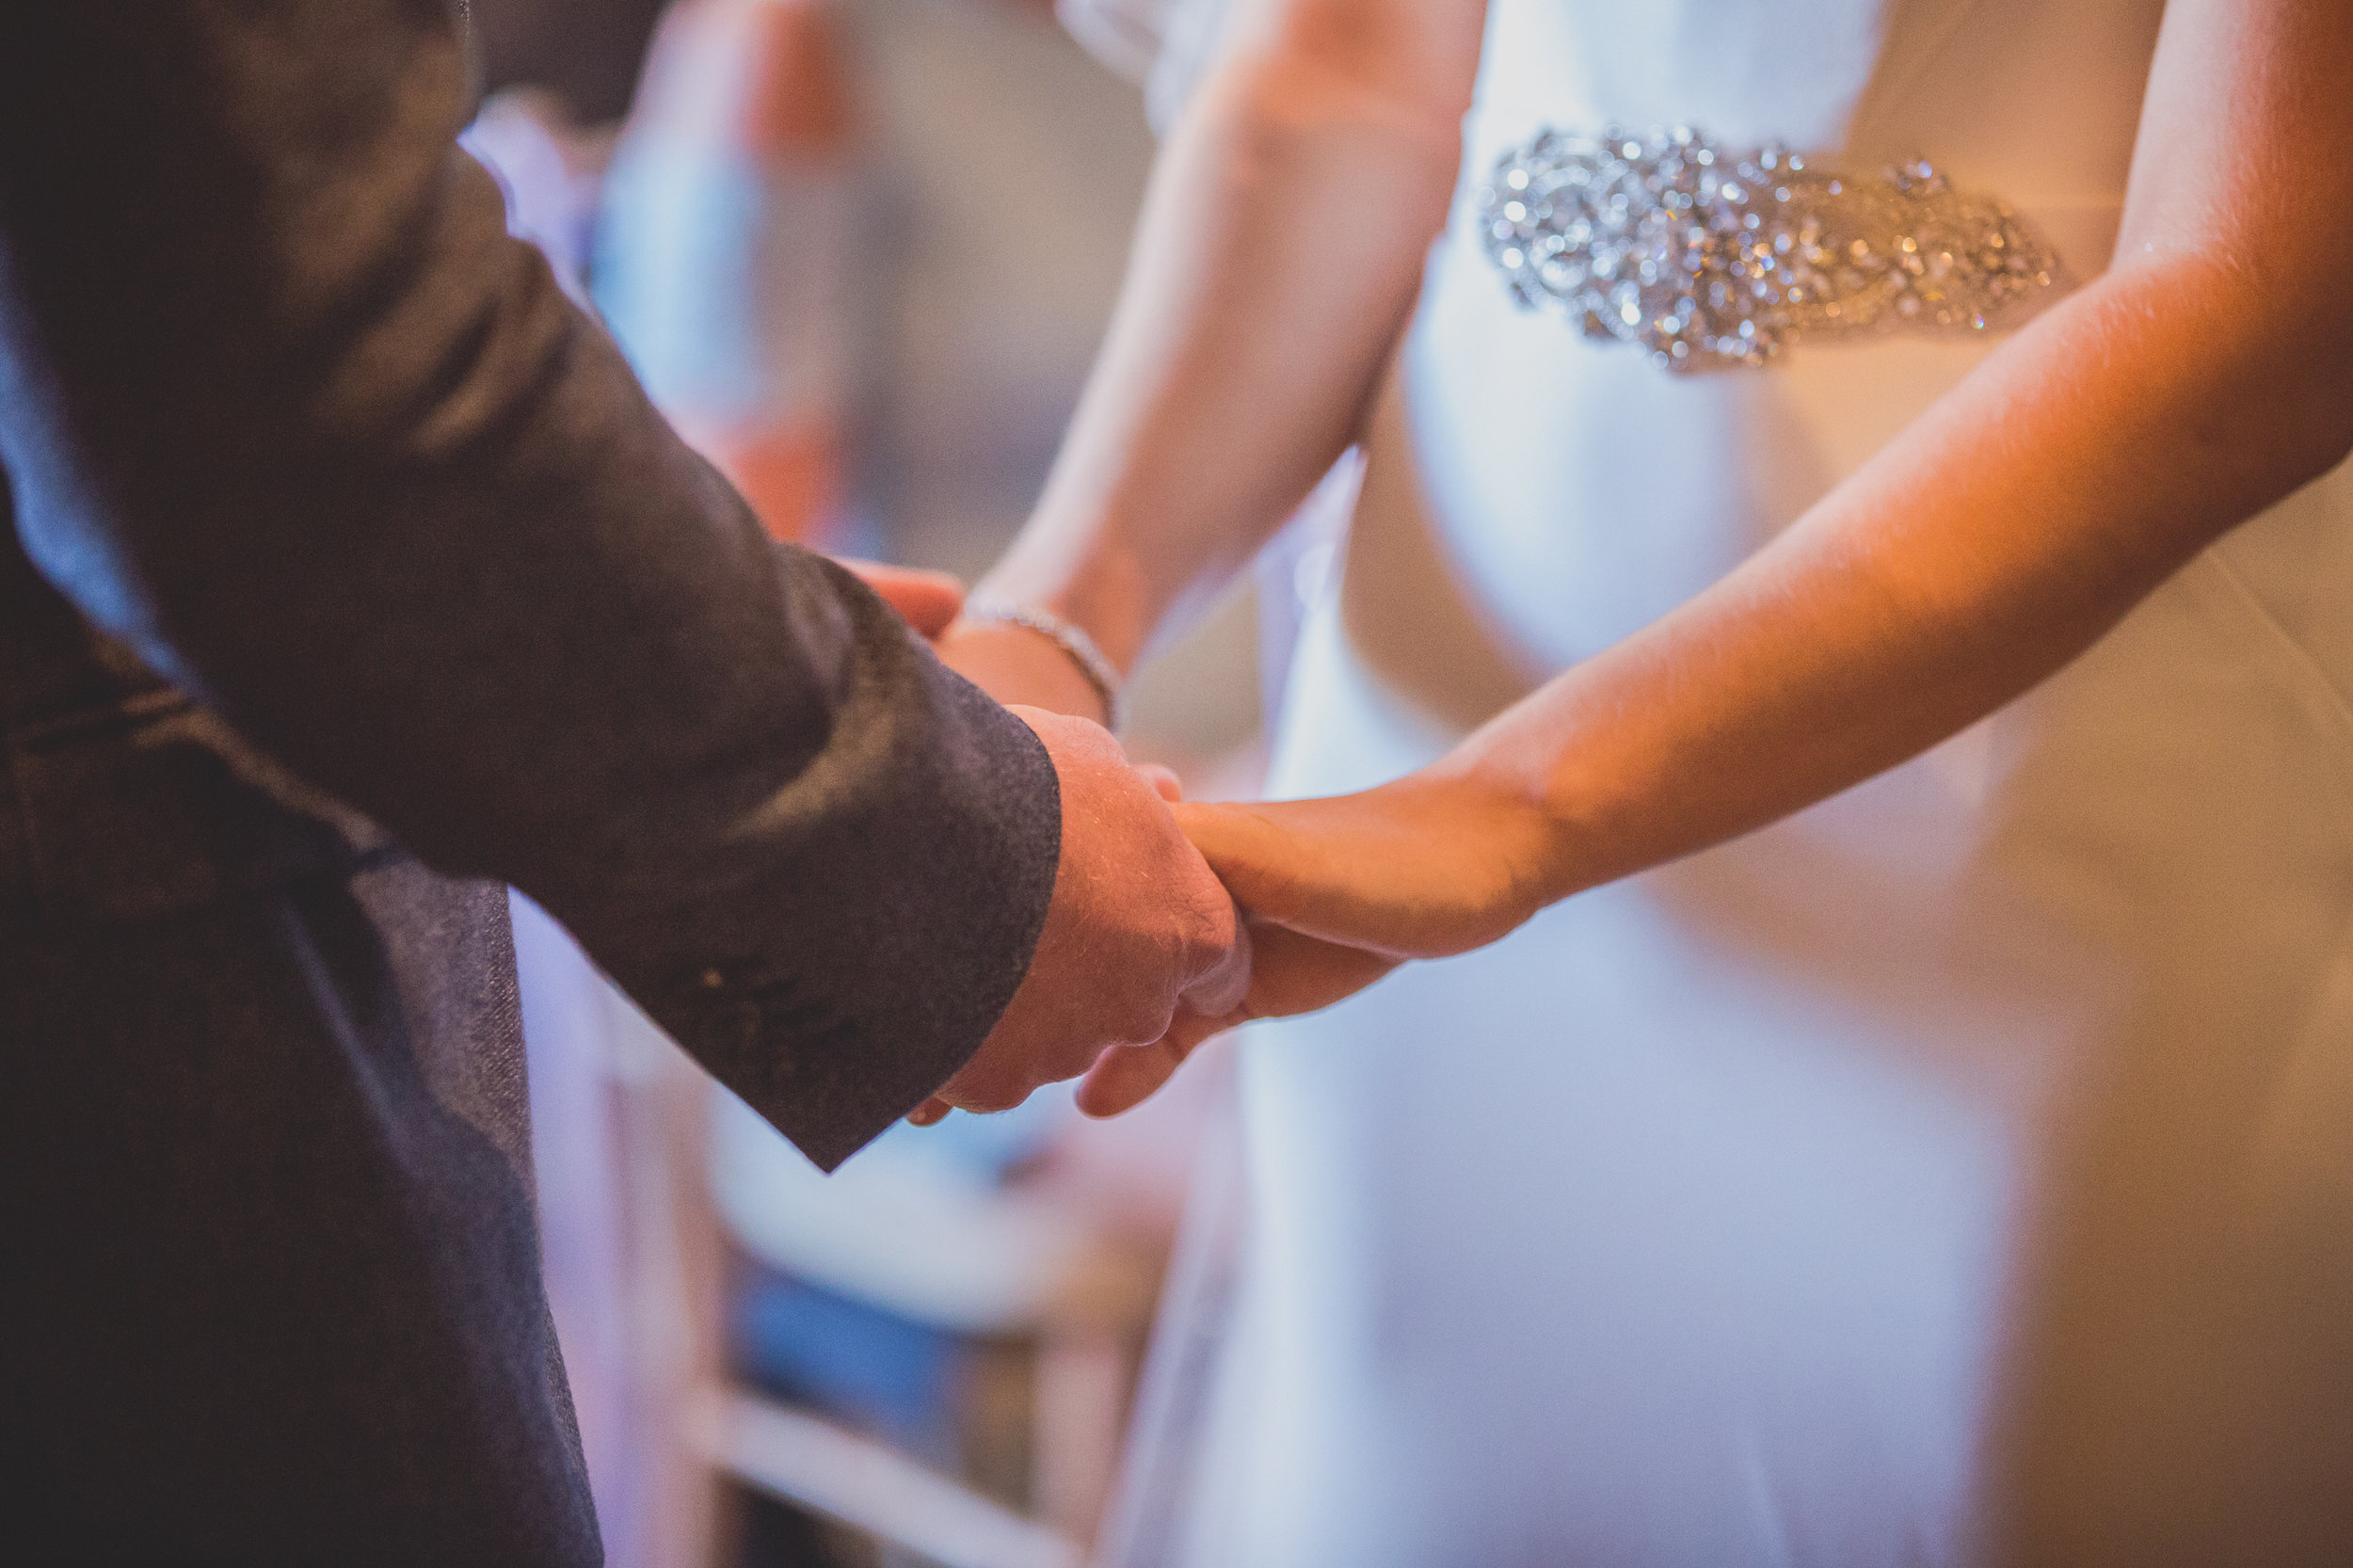 Grittenham Barn female wedding photographers west sussex petworth social-56.jpg